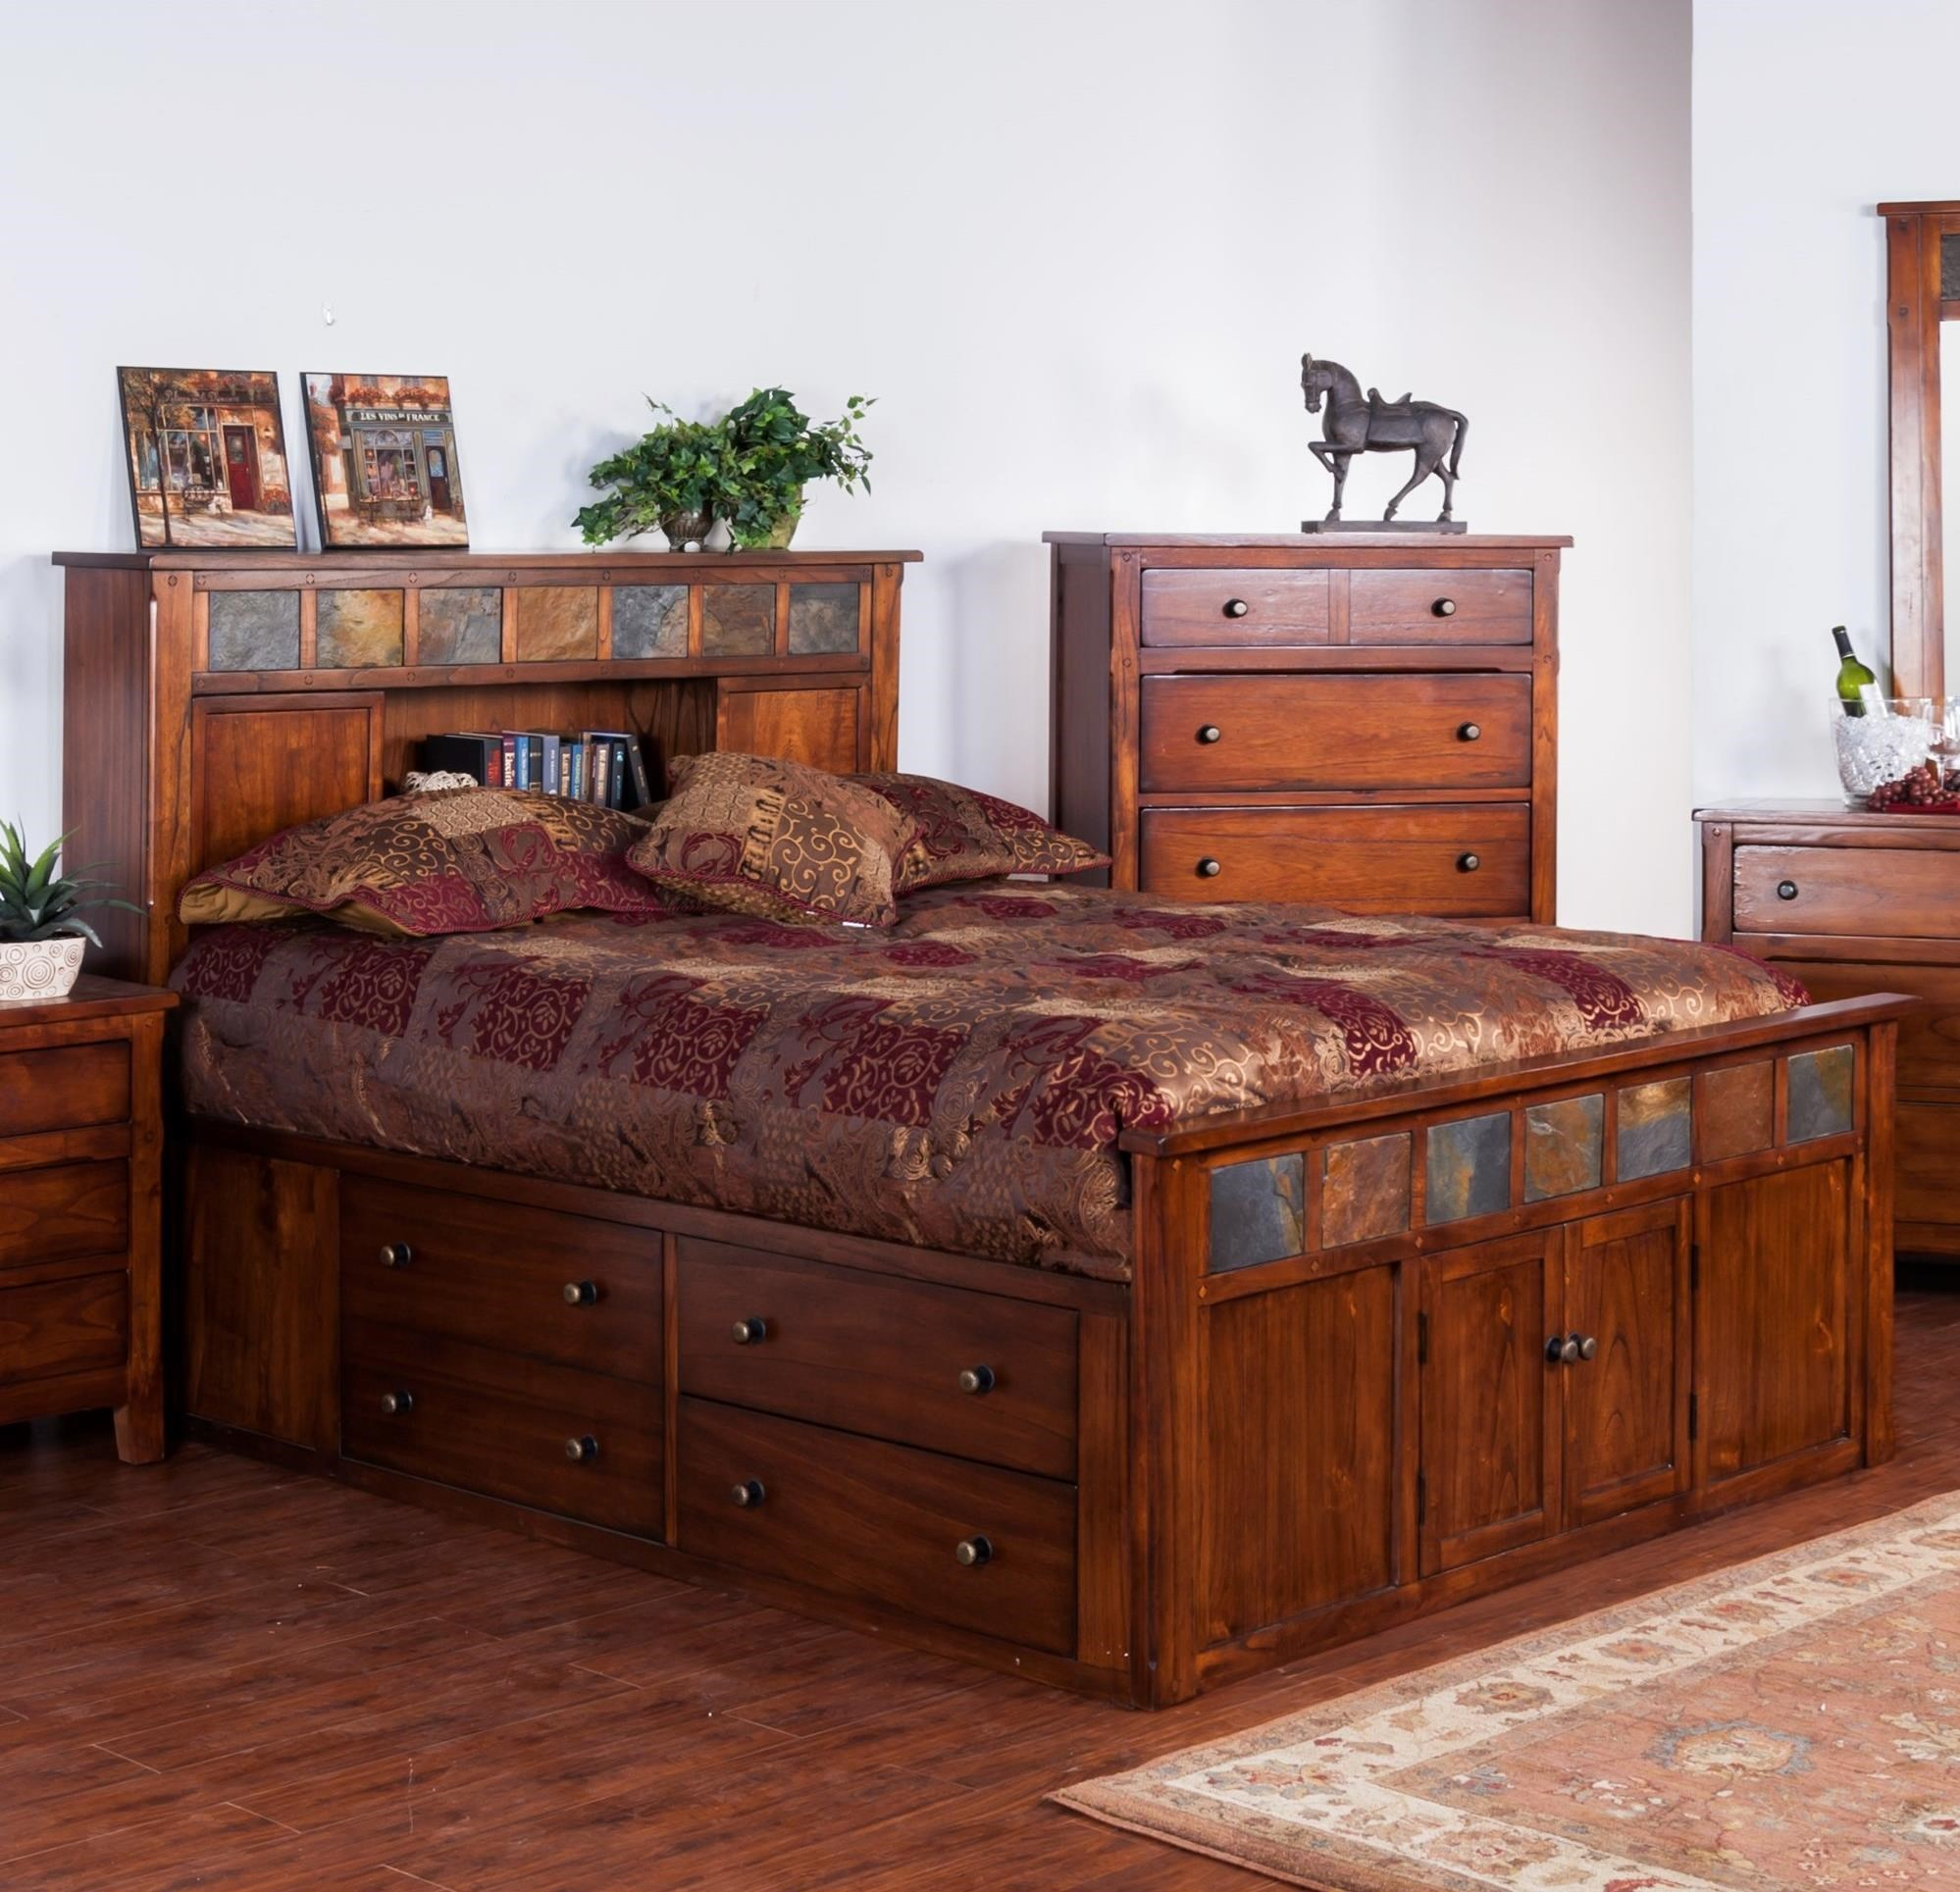 Sunny designs santa fe 2334dc sq queen storage bed w for Santa fe designs